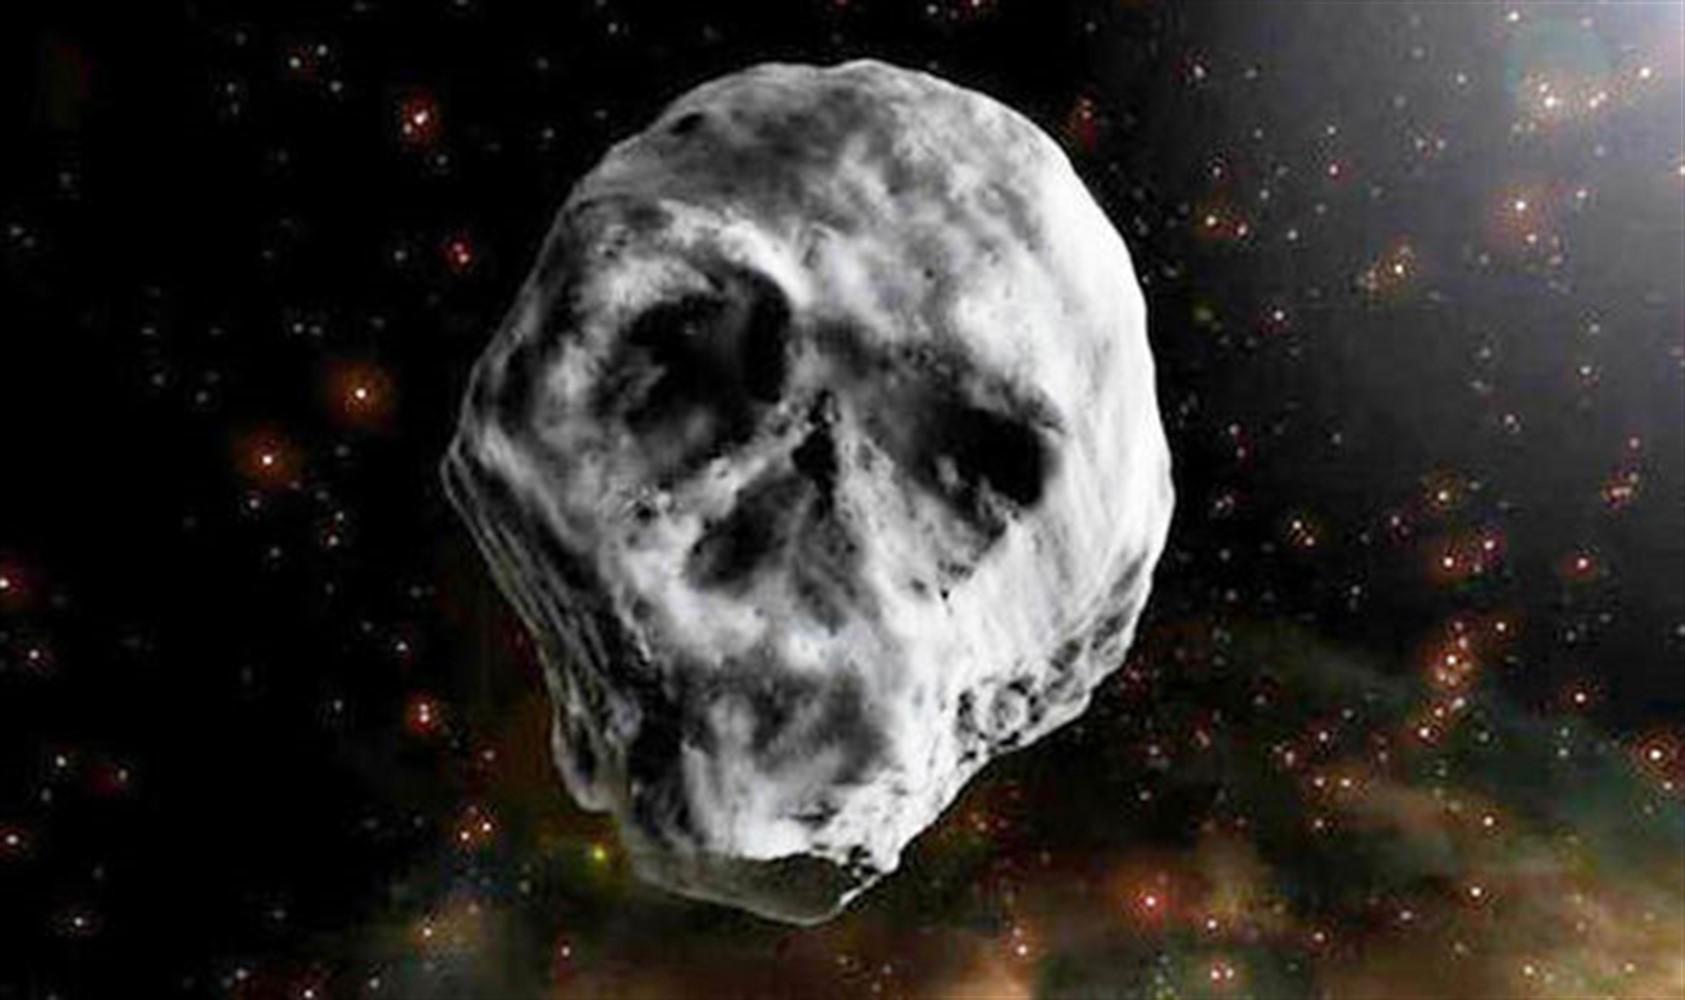 НаХеллоуин кЗемле приблизится астероид вформе черепа